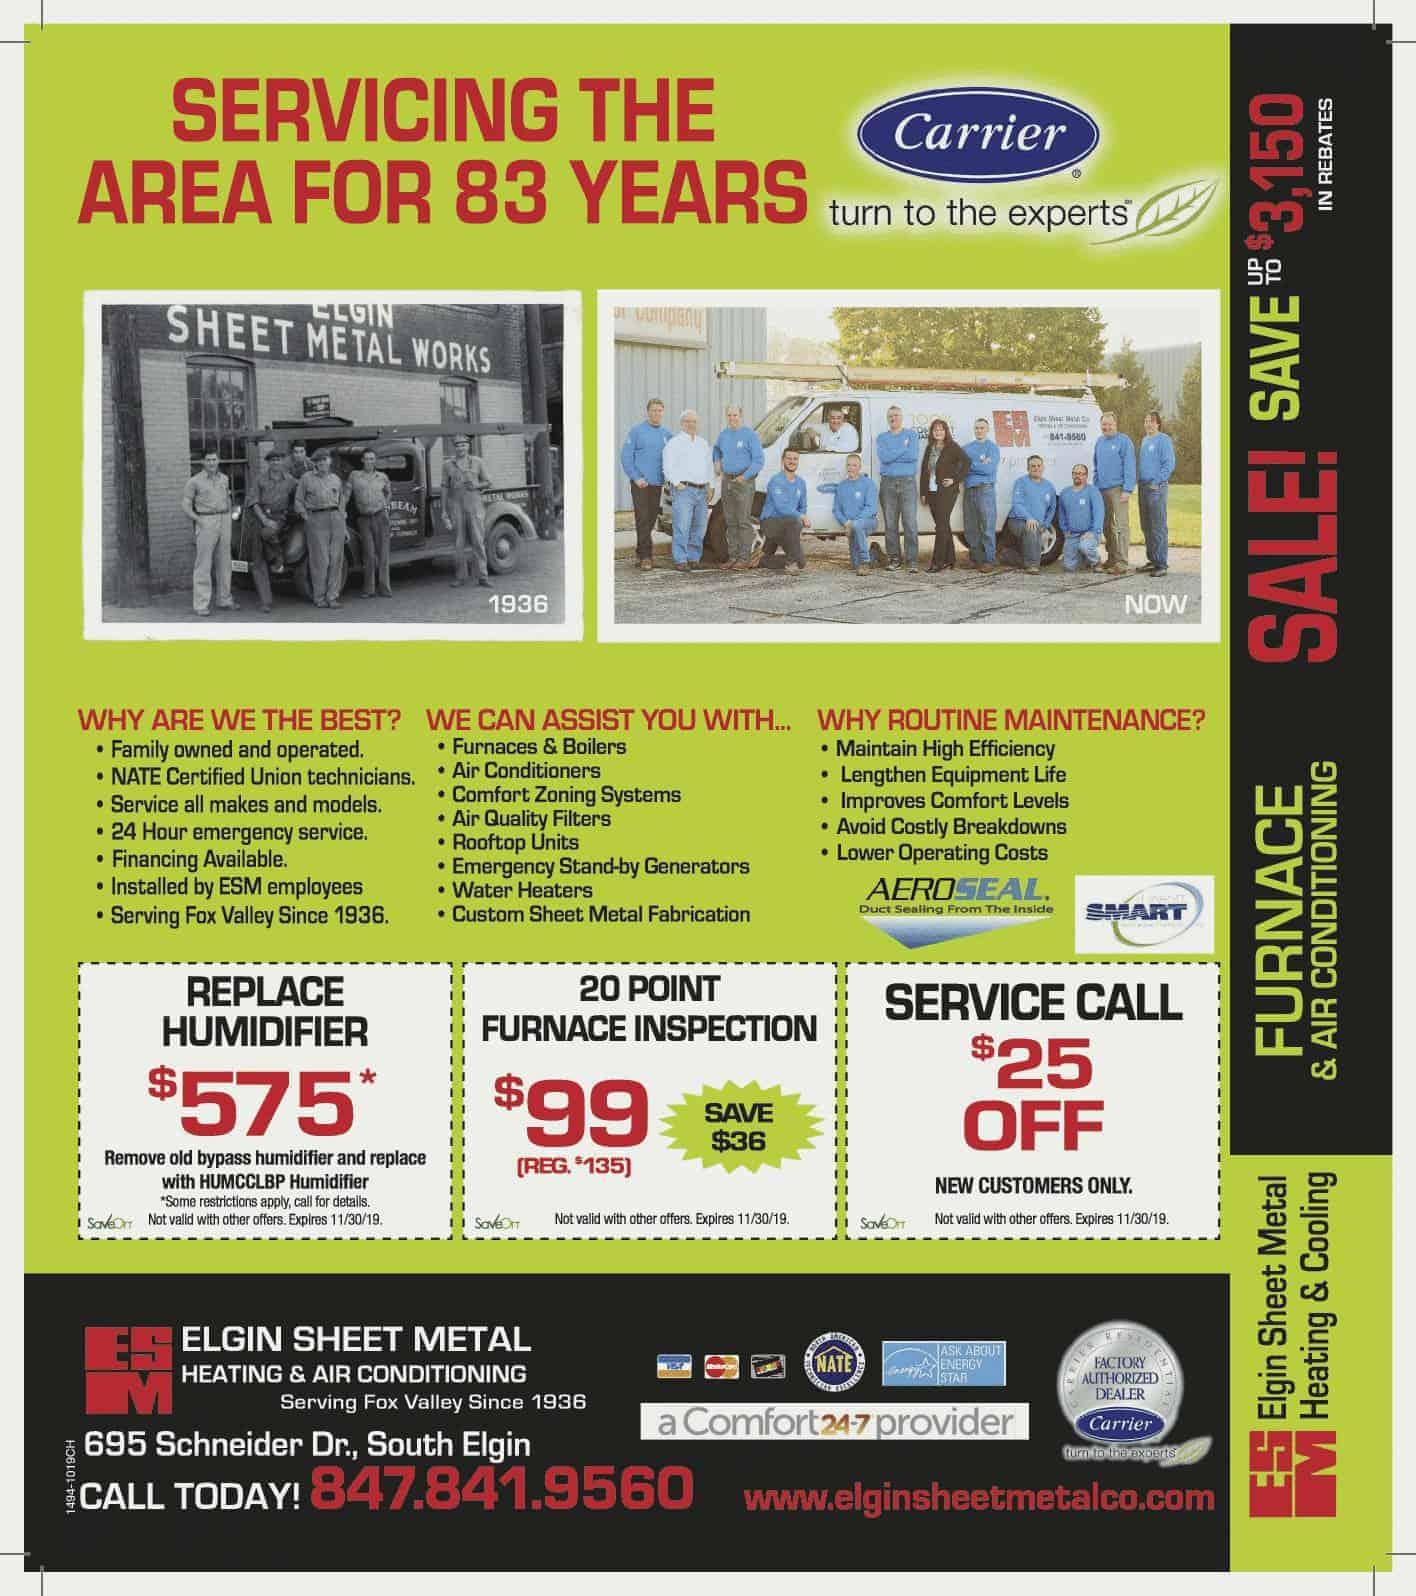 Furnace Special Offer